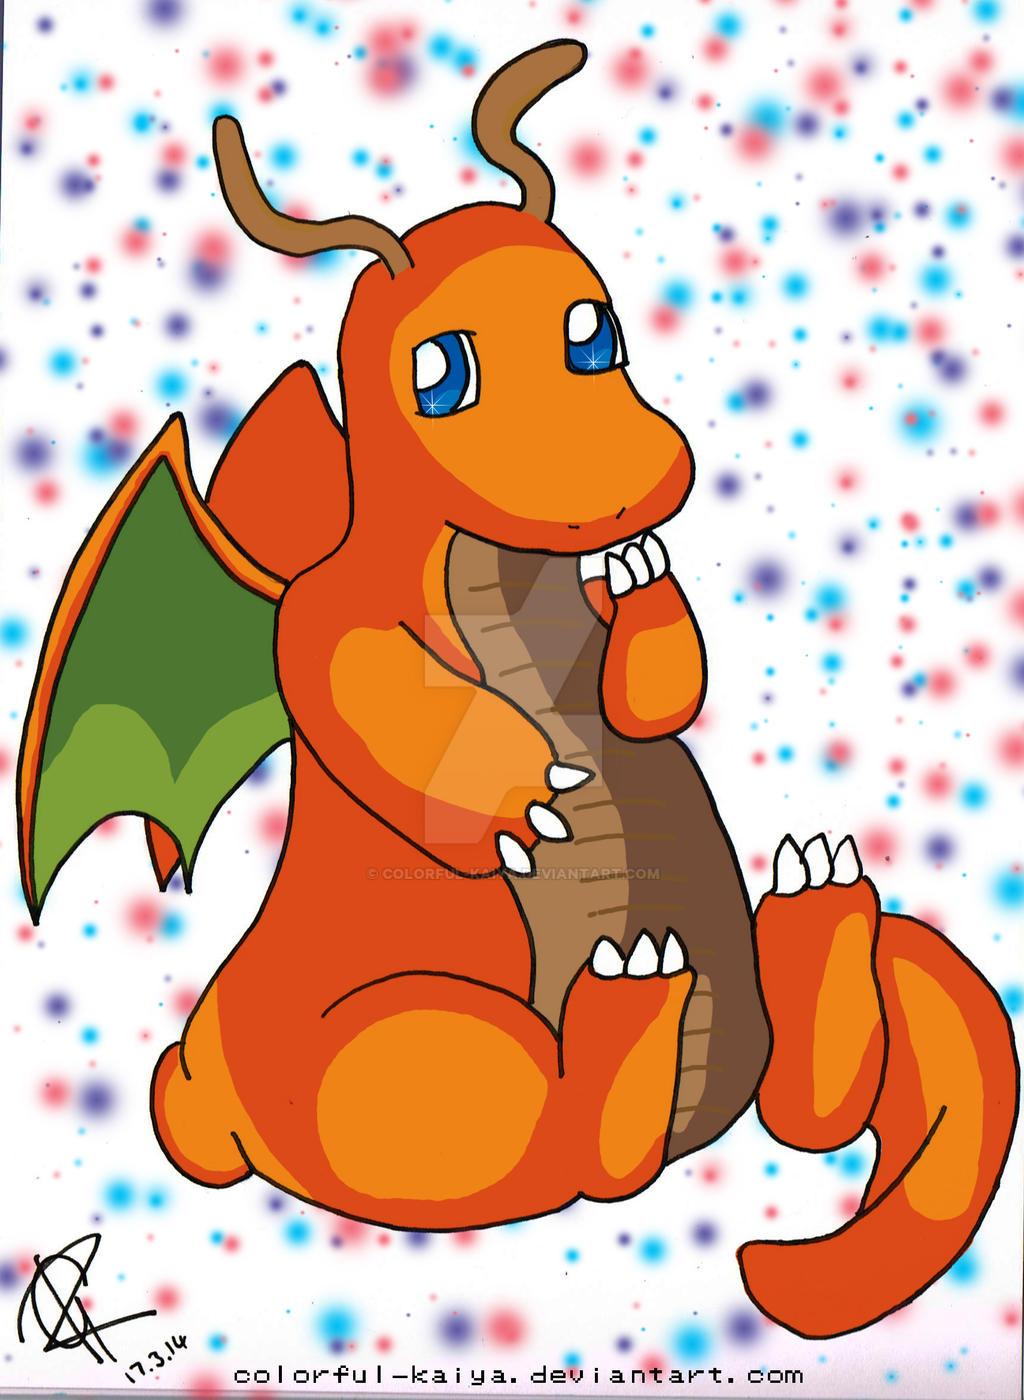 Dragonite #149 by Colorful-Kaiya